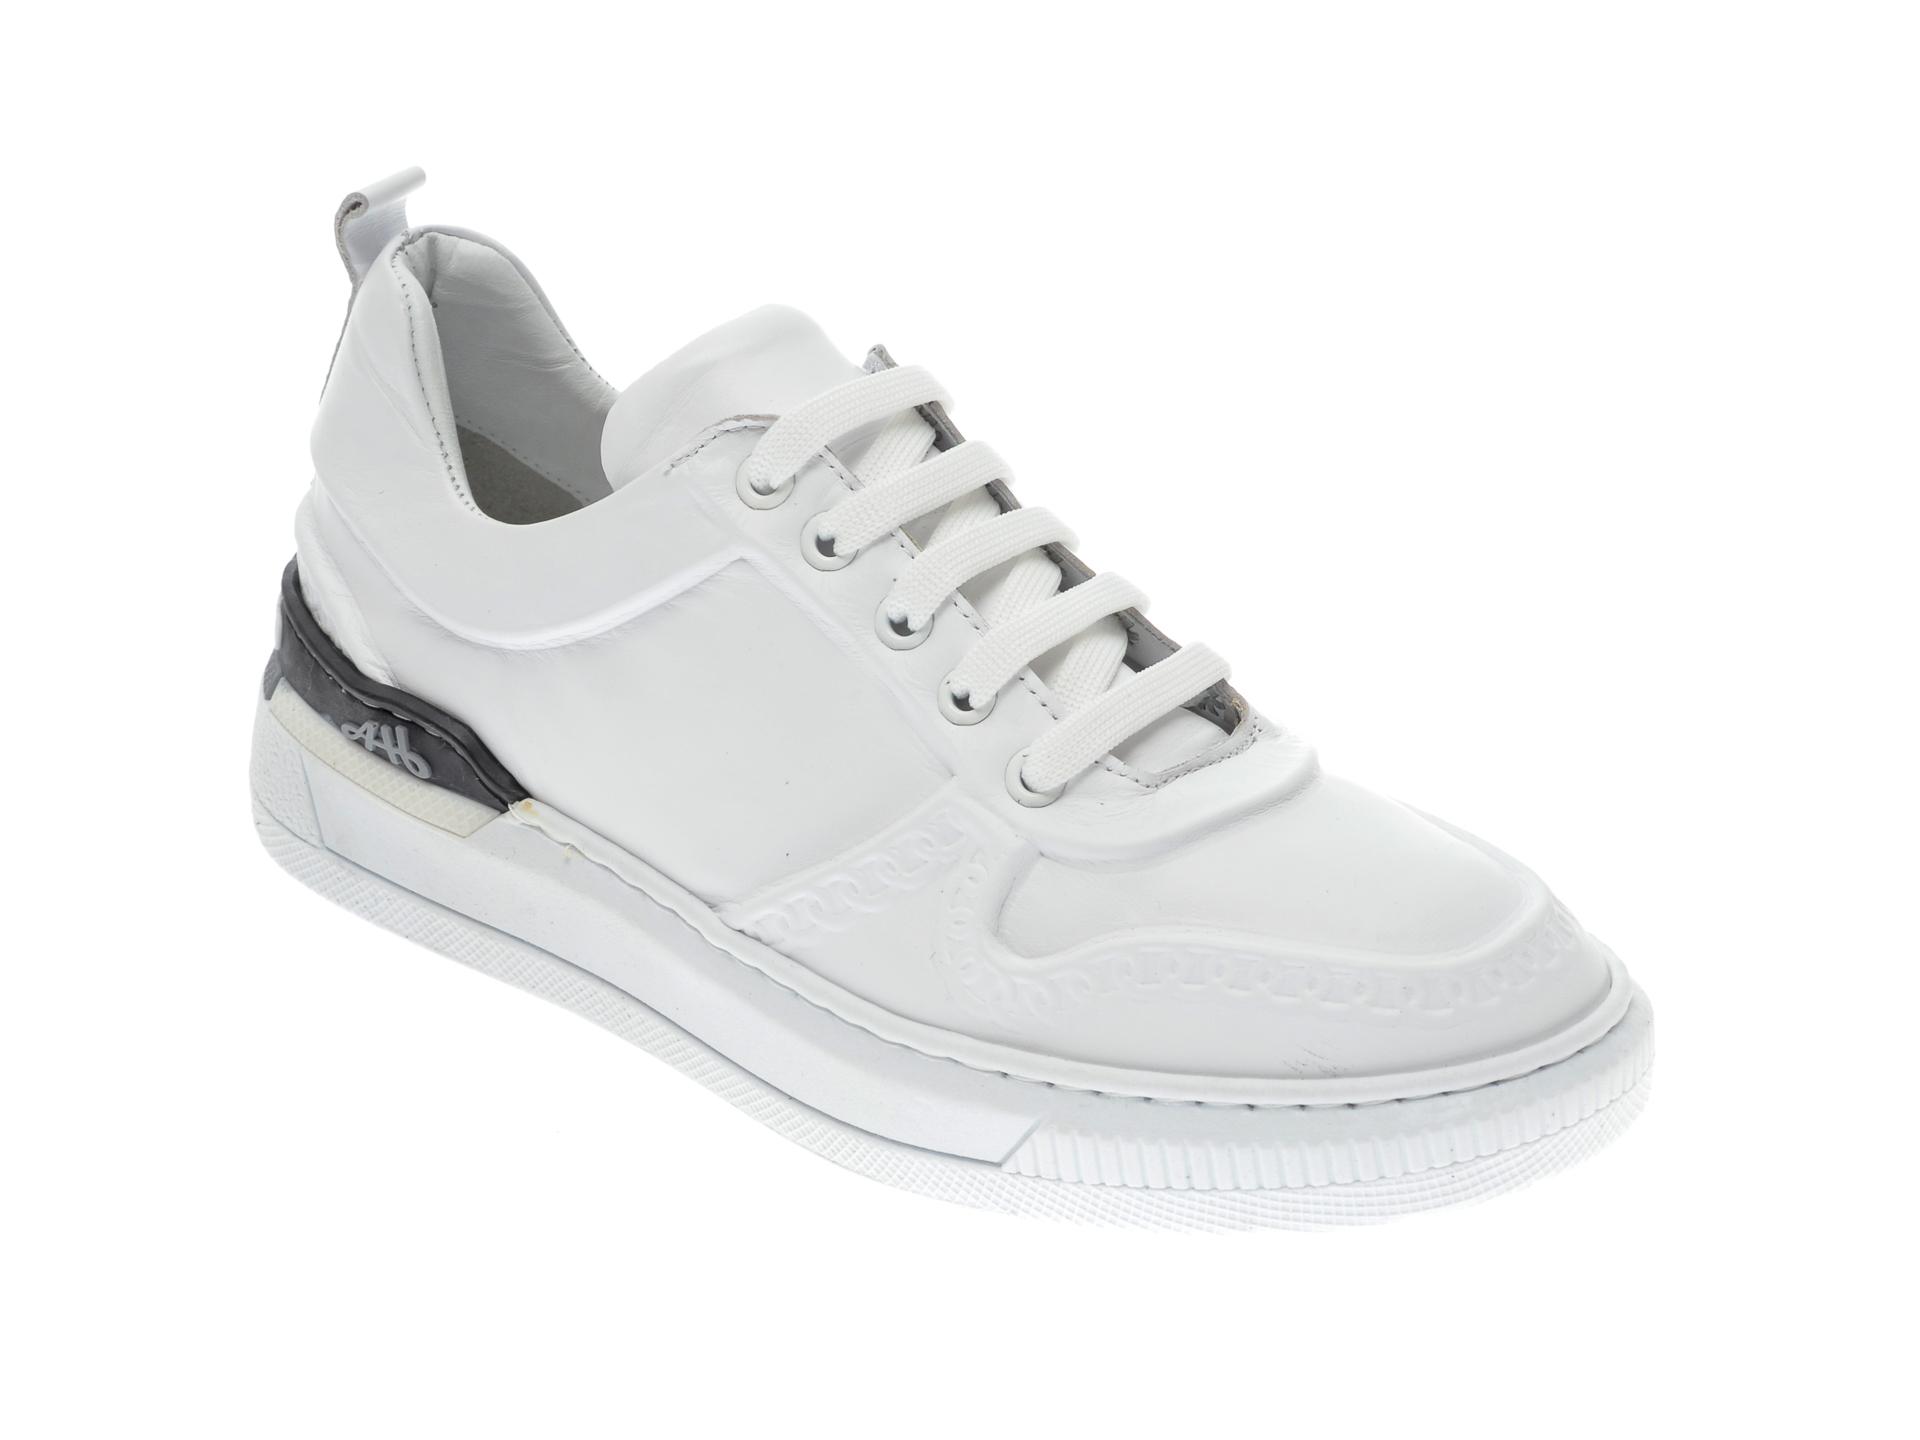 Pantofi Sport Flavia Passini Albi, 054netr, Din Piele Naturala